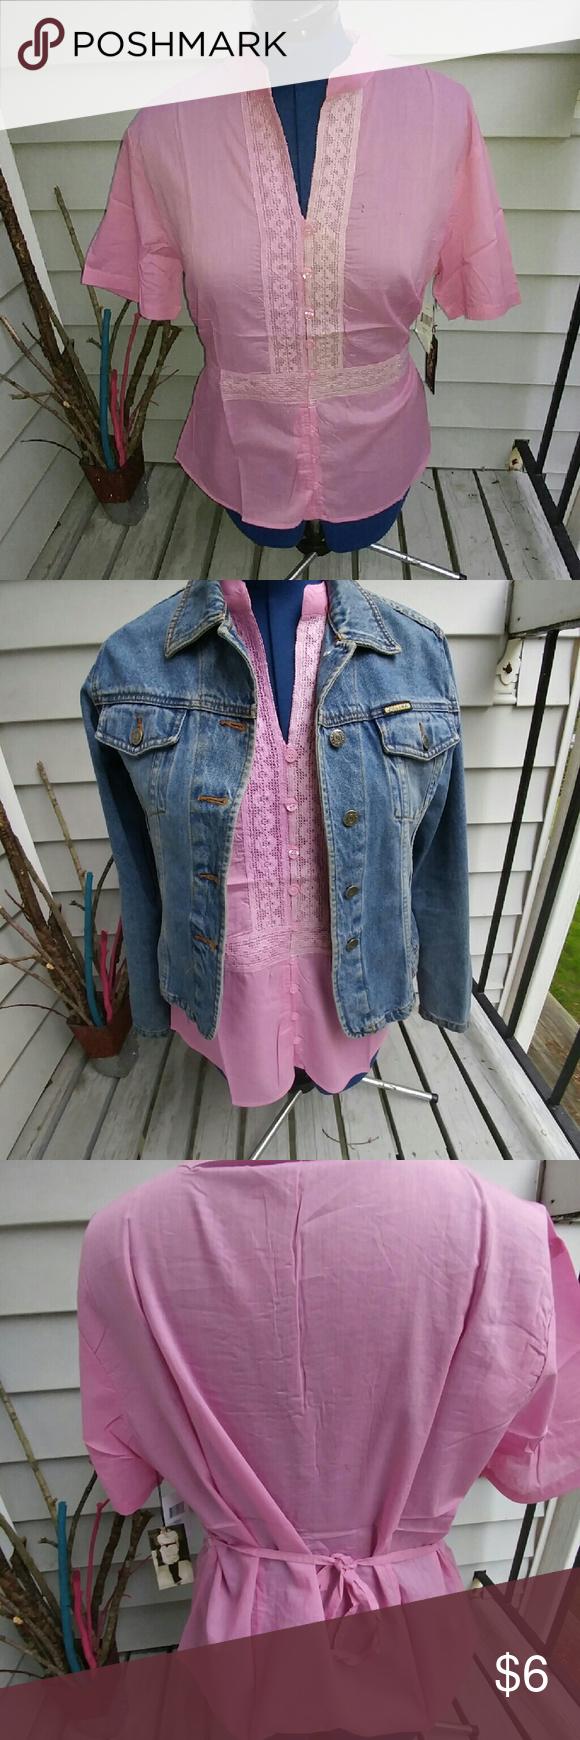 Pink Tunic Tie Top Pink Linen likeTunic 1x 14 2x 16 3x 18  100% cotton Michelle Martin Tops Tunics